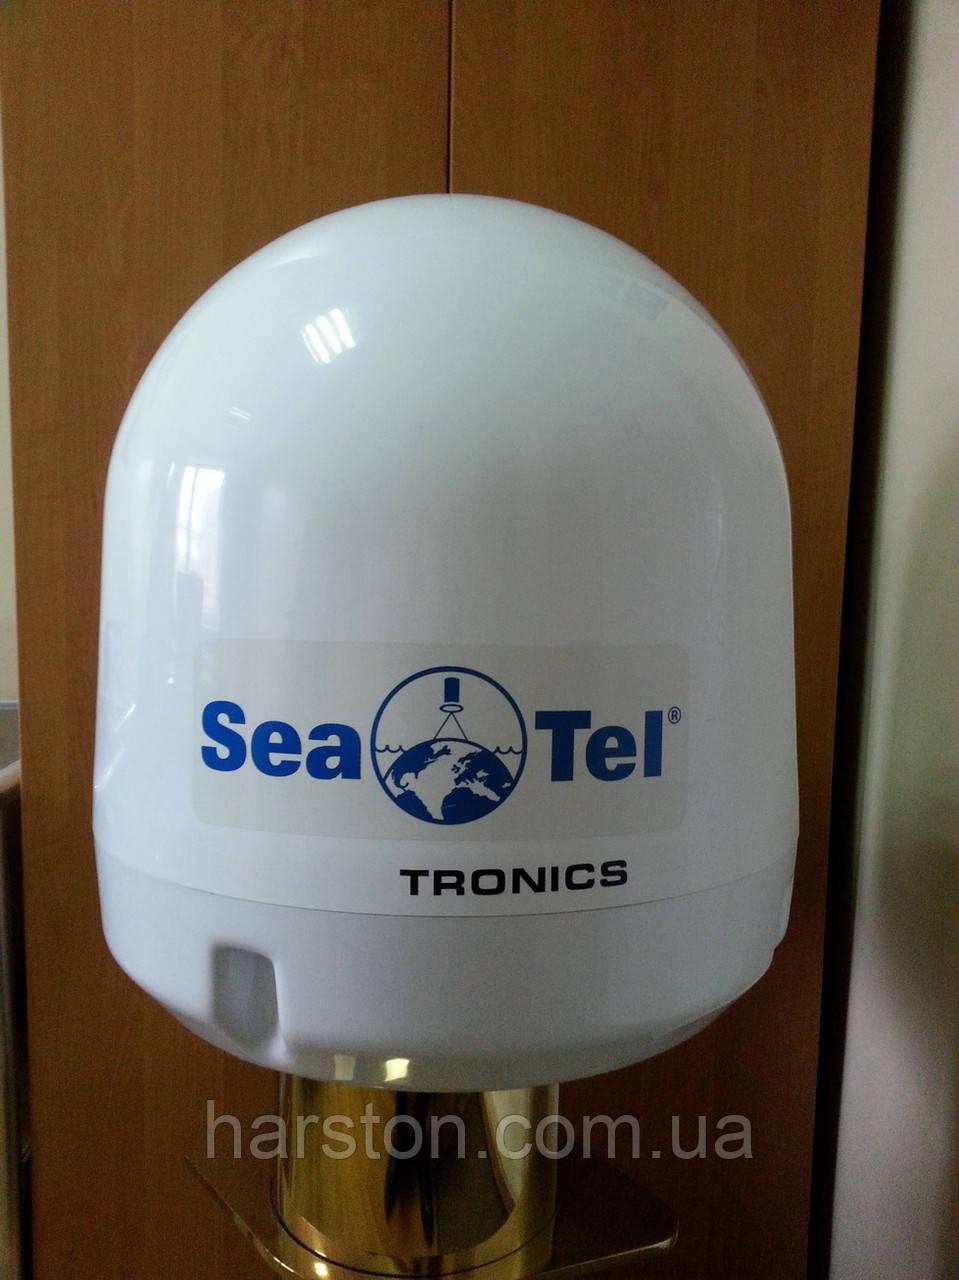 SeaTel Coastal 18, 45см б/у (аналог KVH TracVision M5, Intellian i4) Спутниковая антенна для яхт под НТВ+